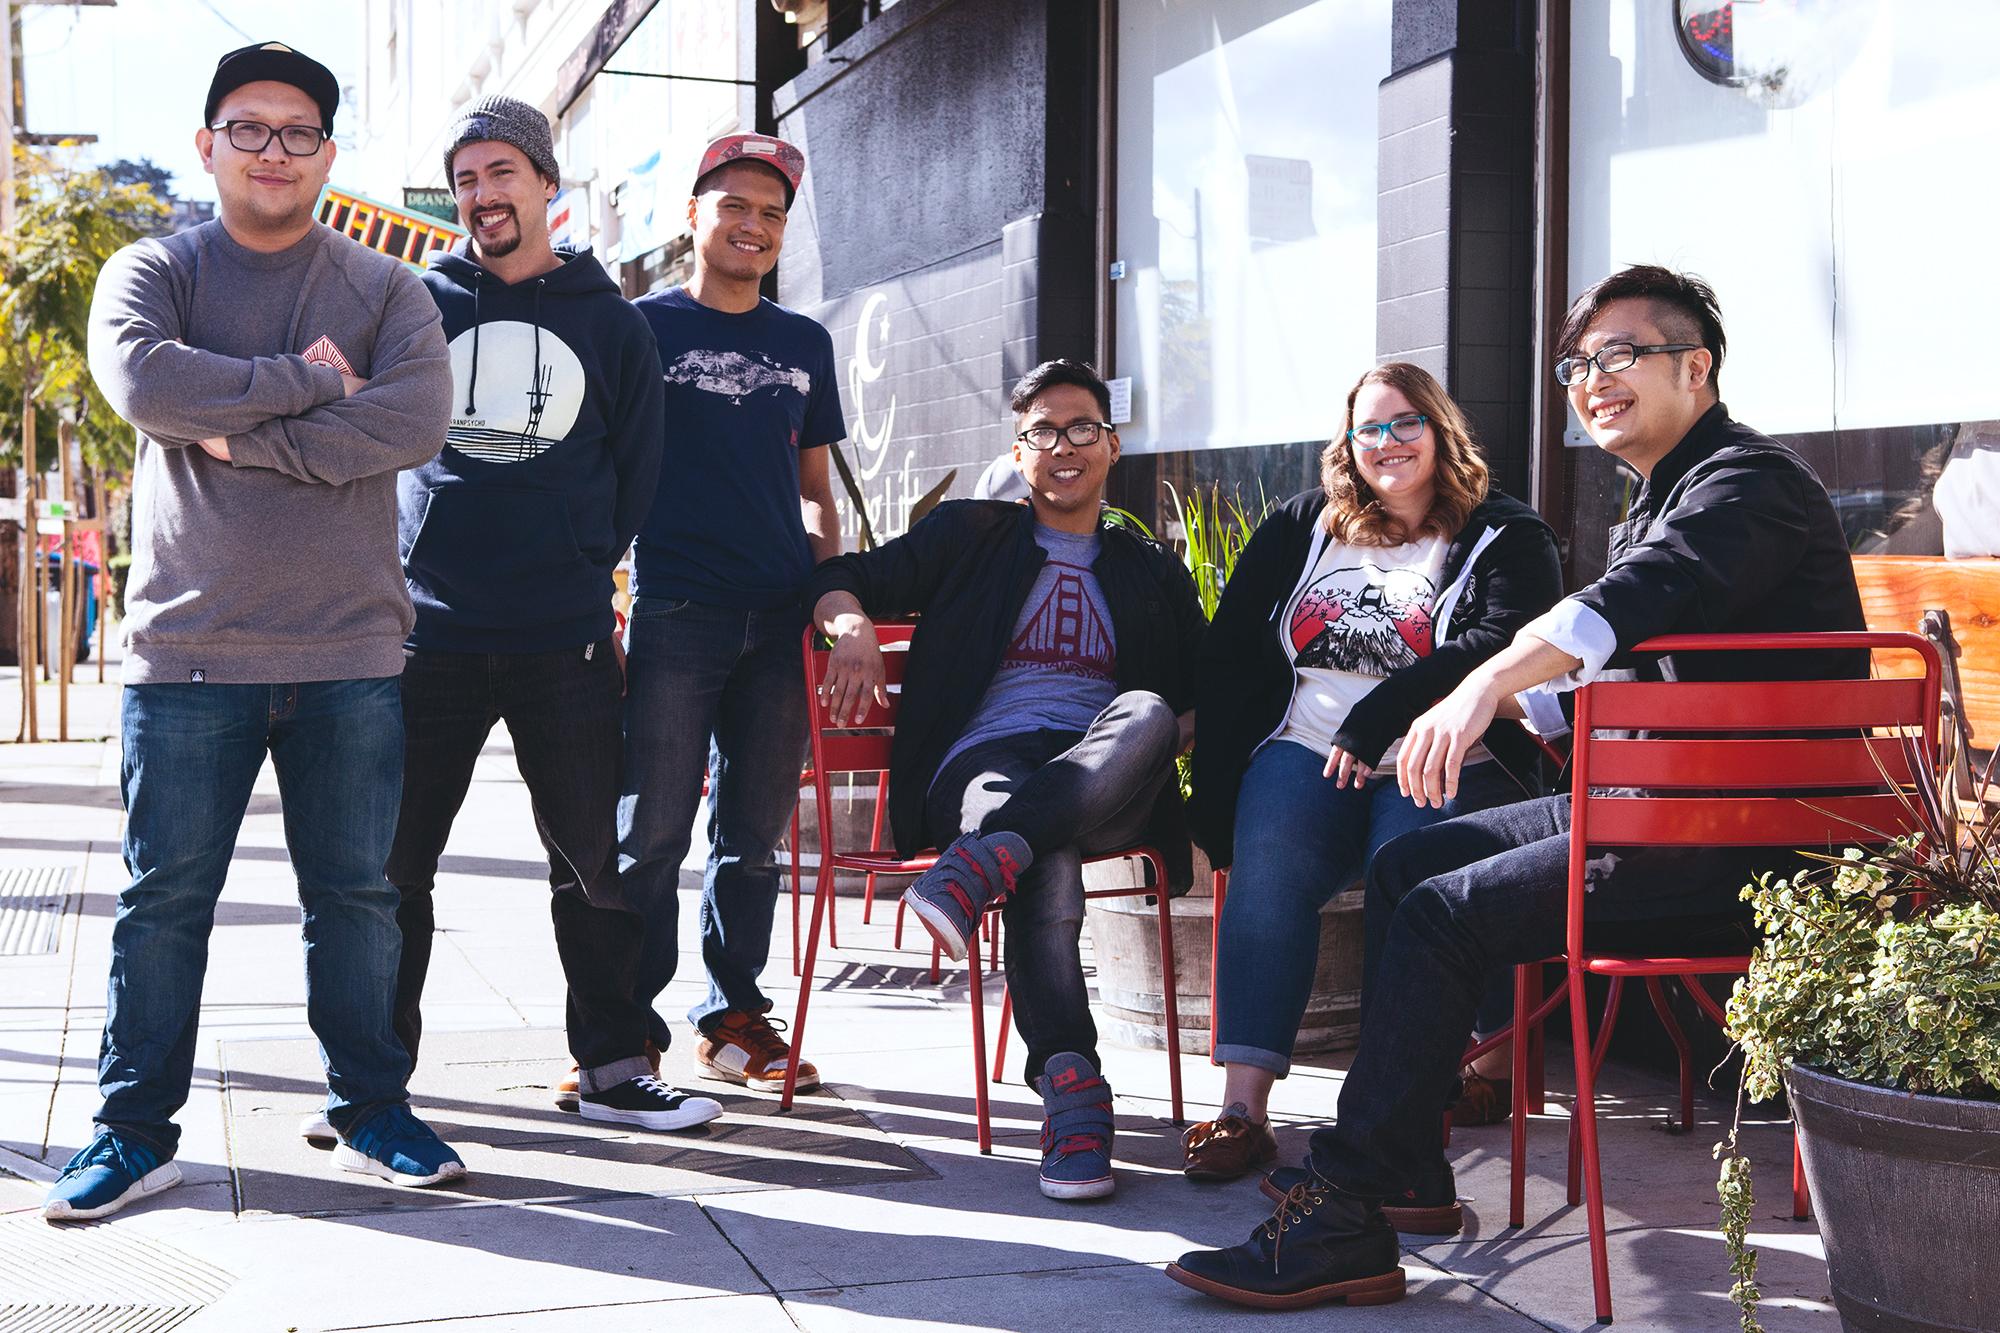 The In Hiatus team wearing San Franpsycho, Photography by  Danielle Rueda